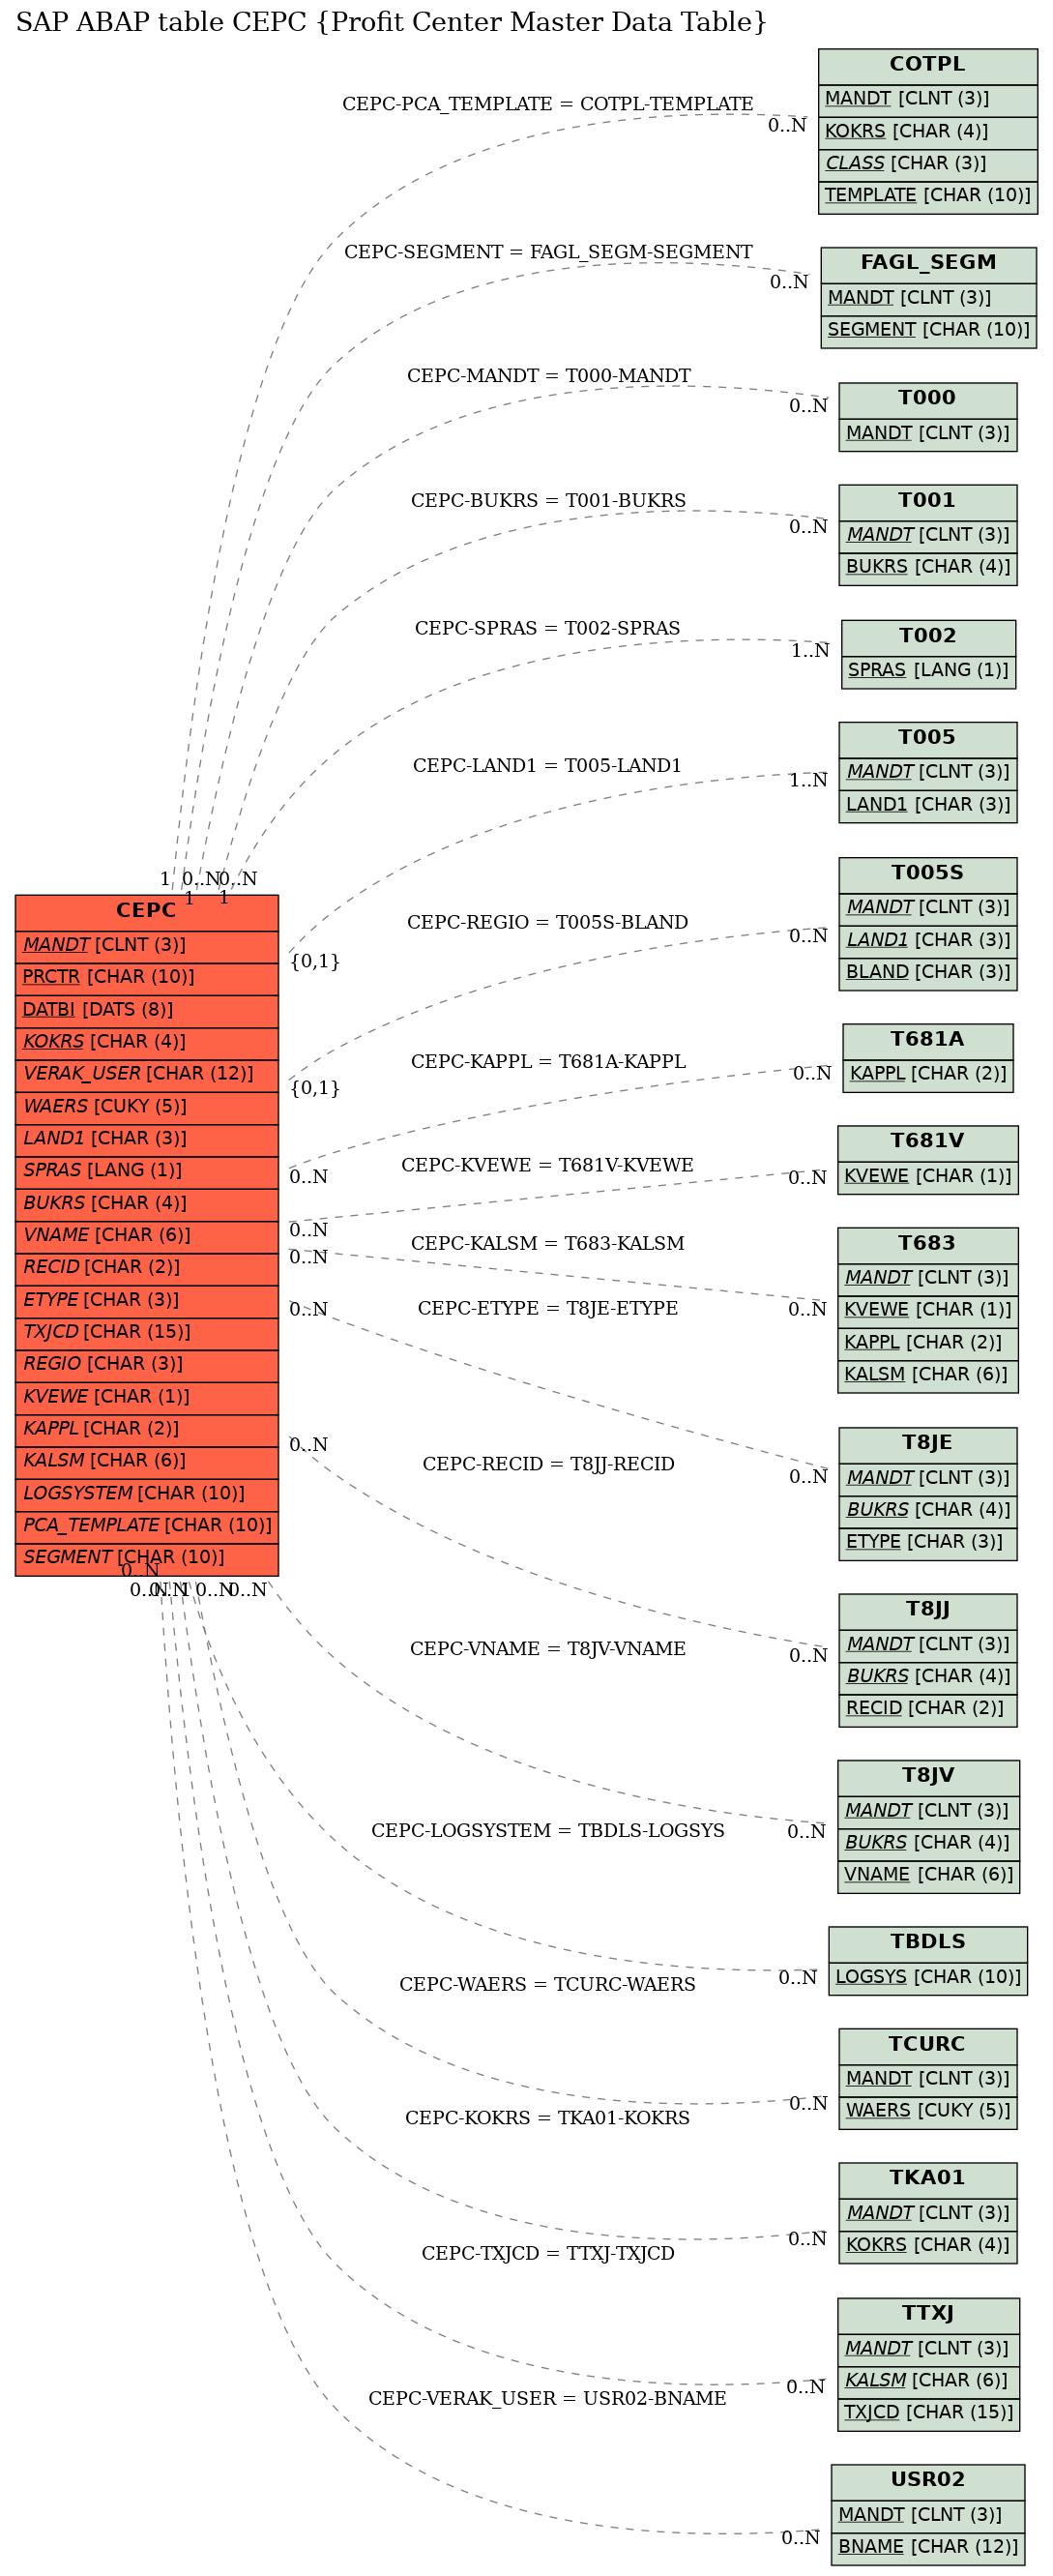 E-R Diagram for table CEPC (Profit Center Master Data Table)